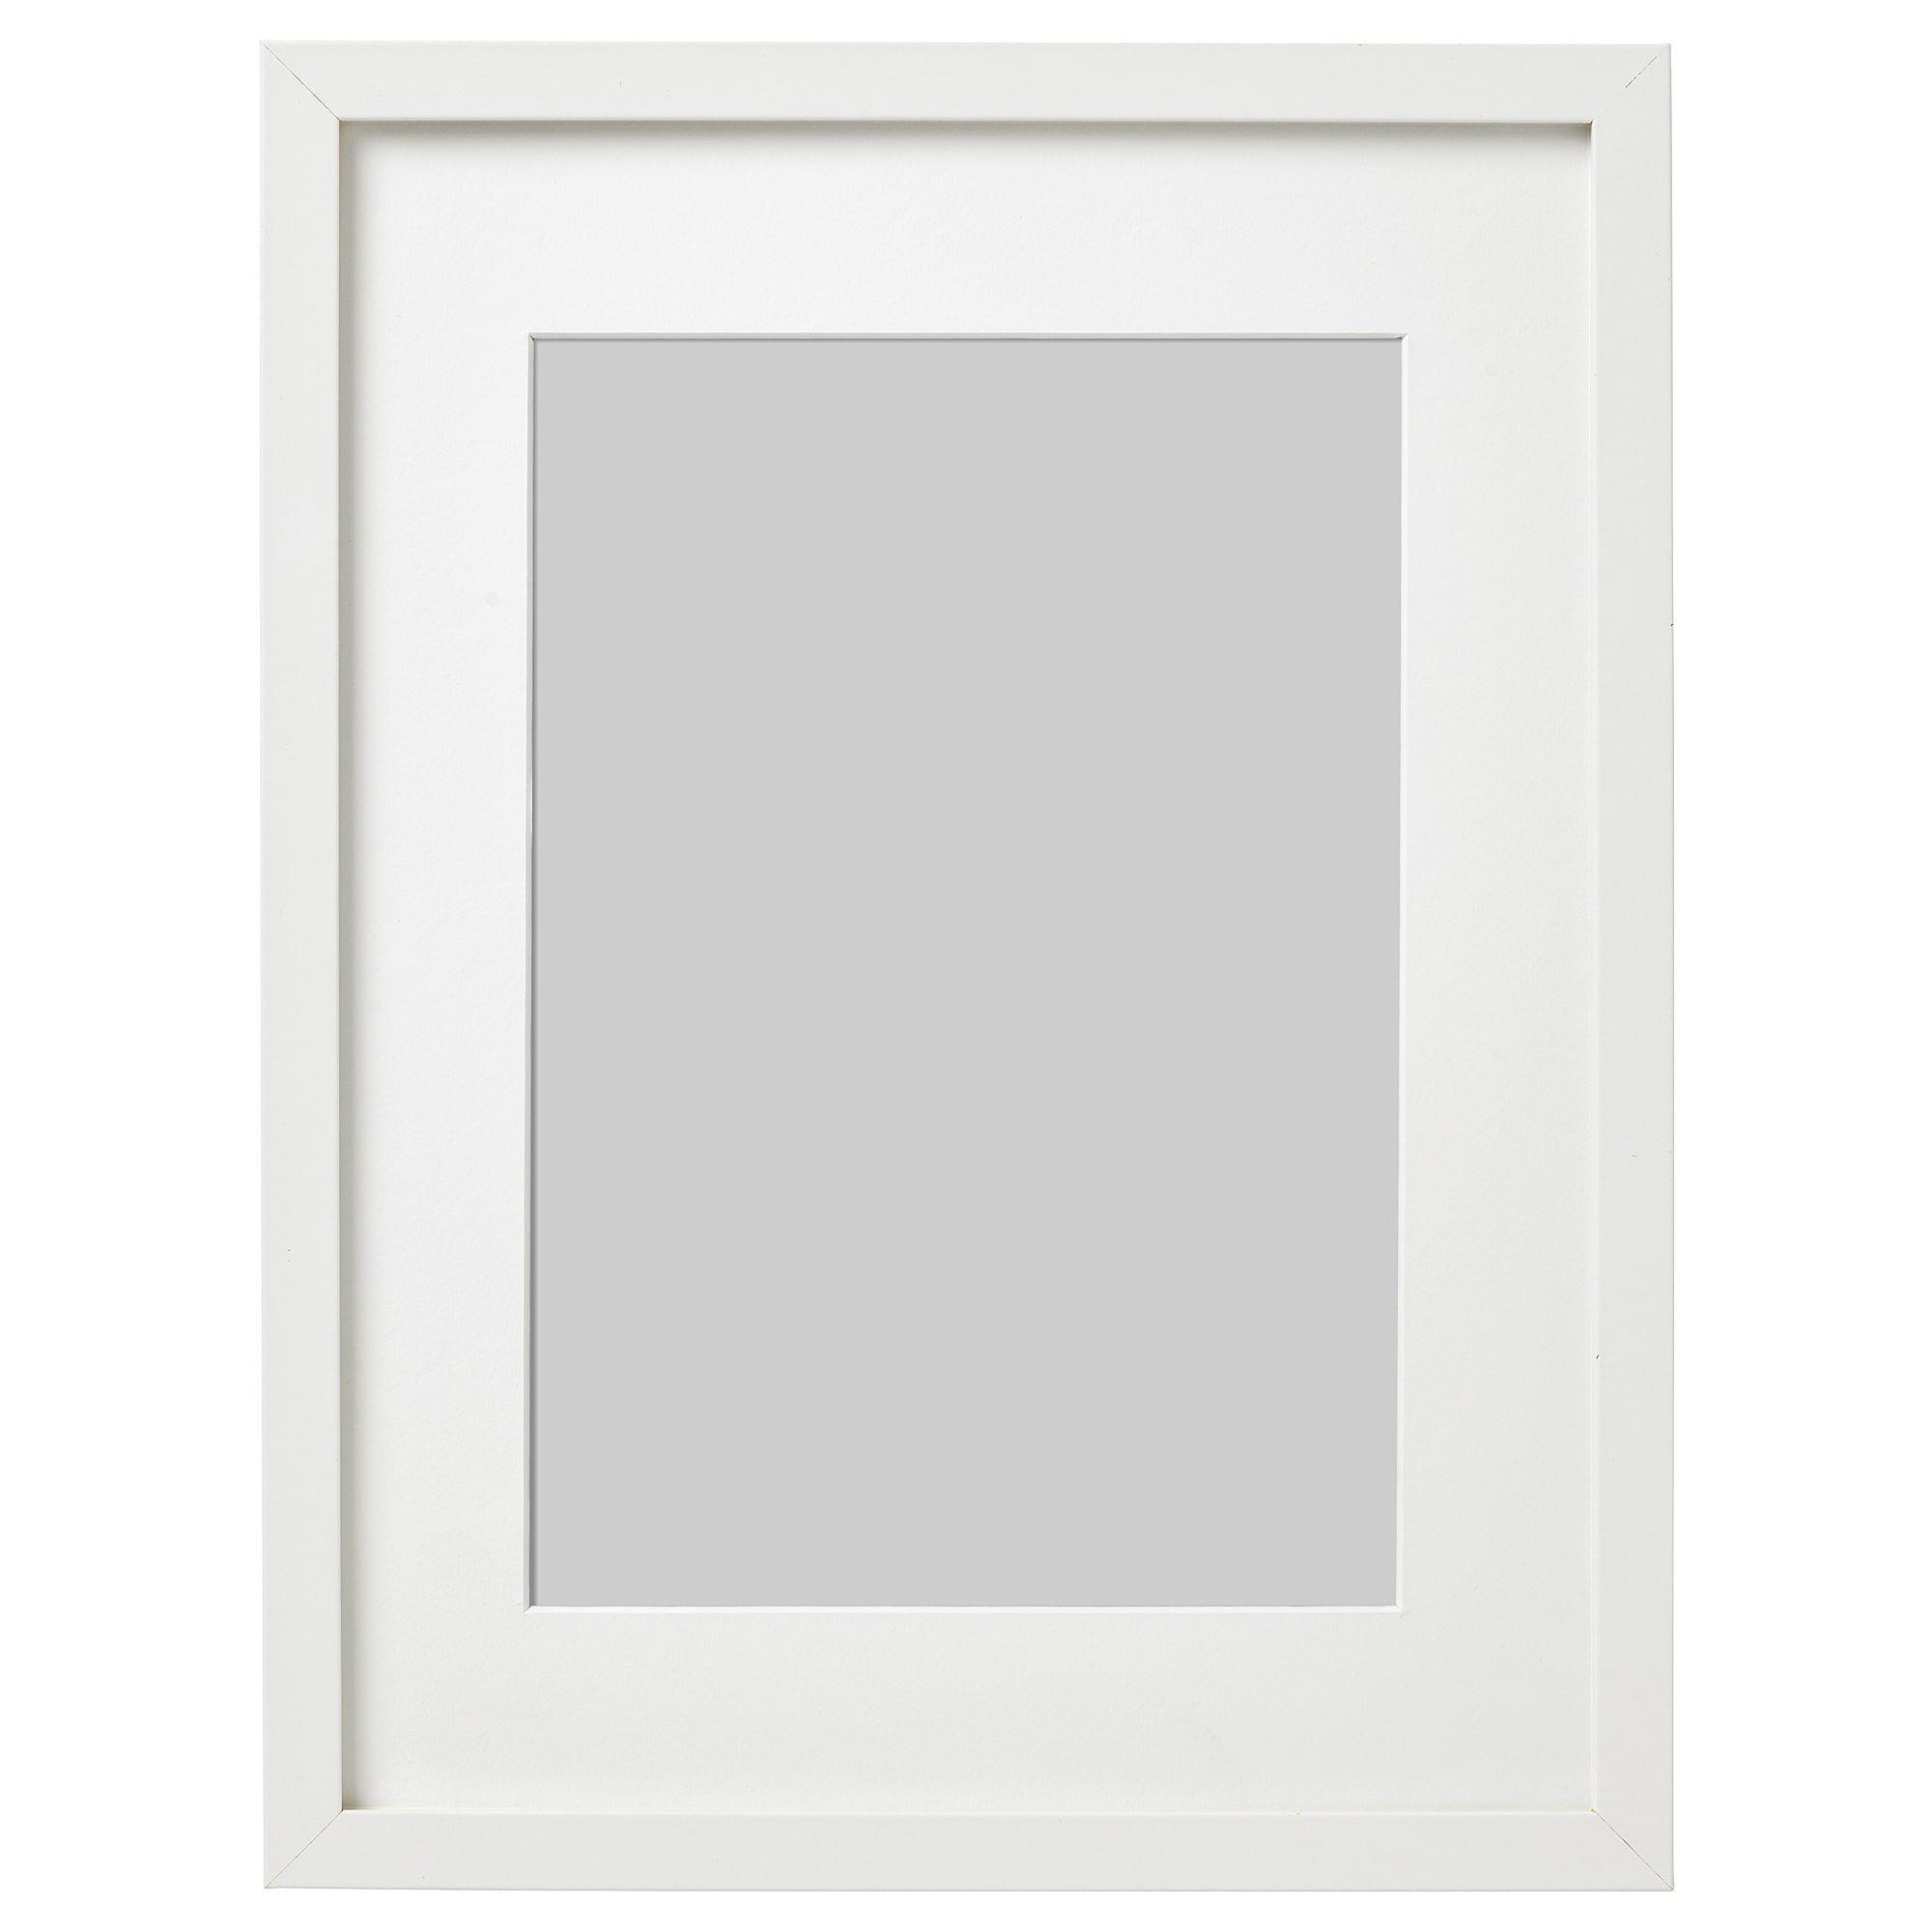 Ribba Frame White Ikea In 2020 Ribba Frame Frames On Wall Frame